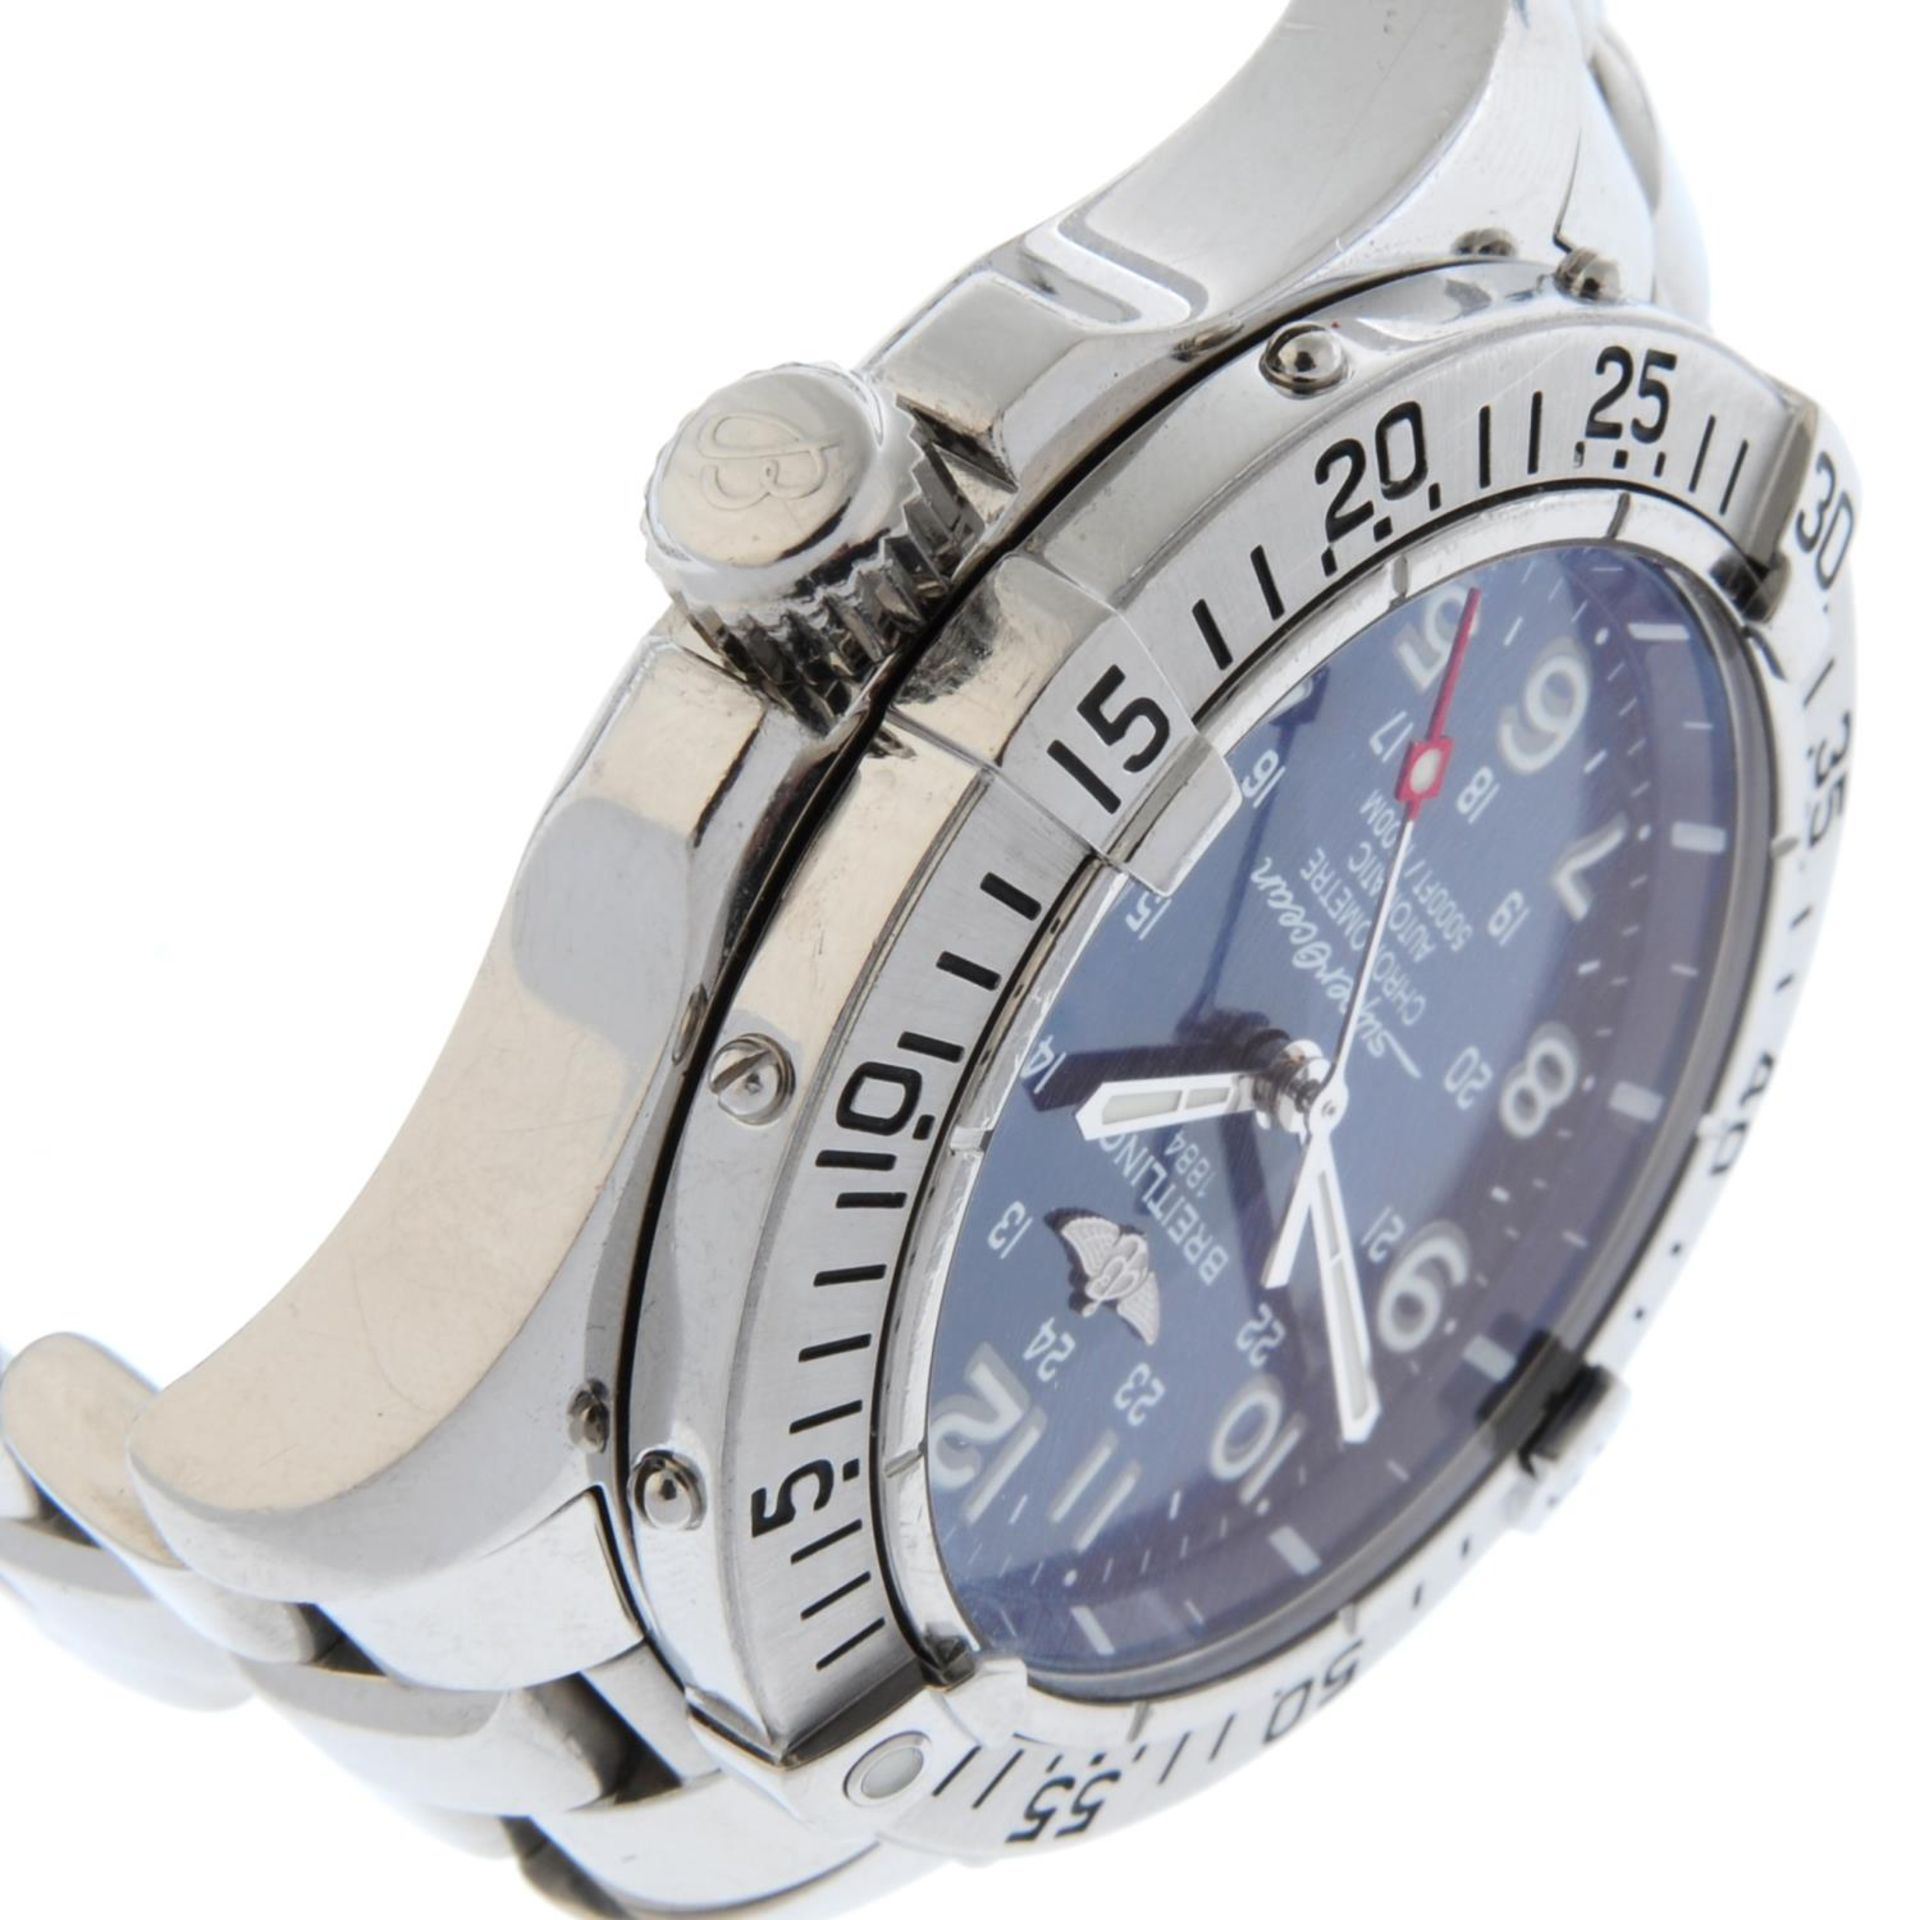 BREITLING - a SuperOcean bracelet watch. - Bild 4 aus 5